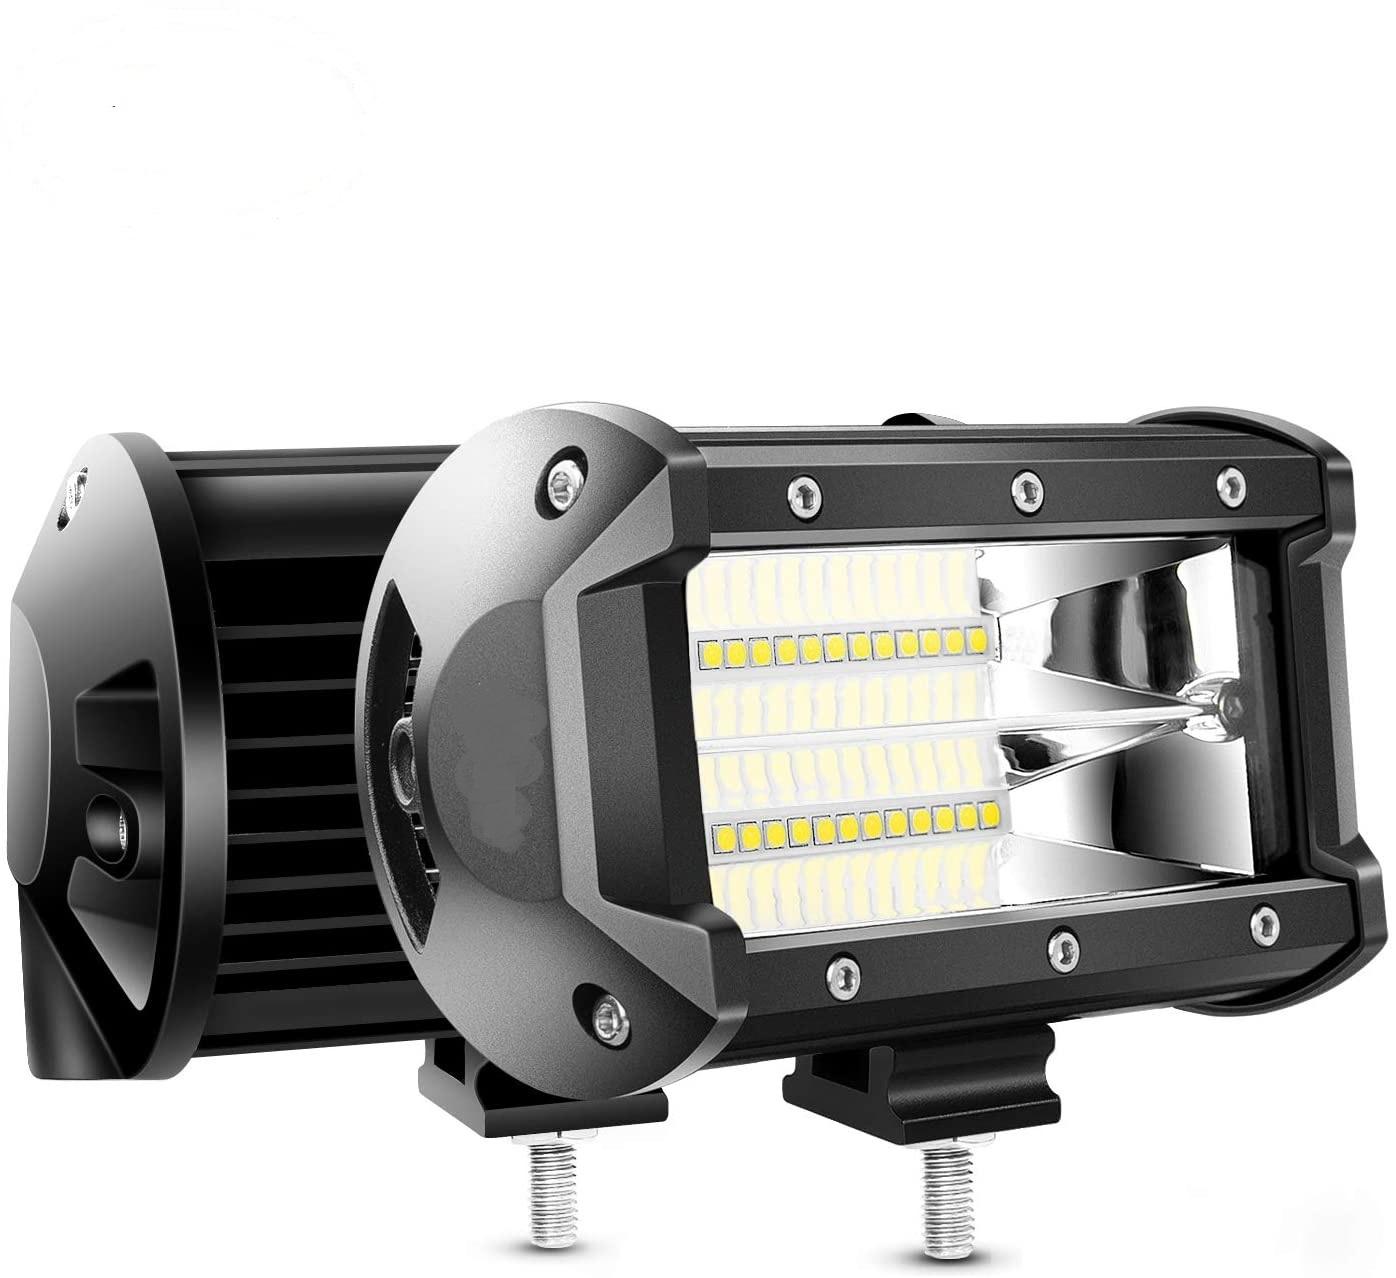 5Inch 72 Watt Double Row Flood Bar 10800Lumens Set Of 2 Led Light Bar / Led Spot Light